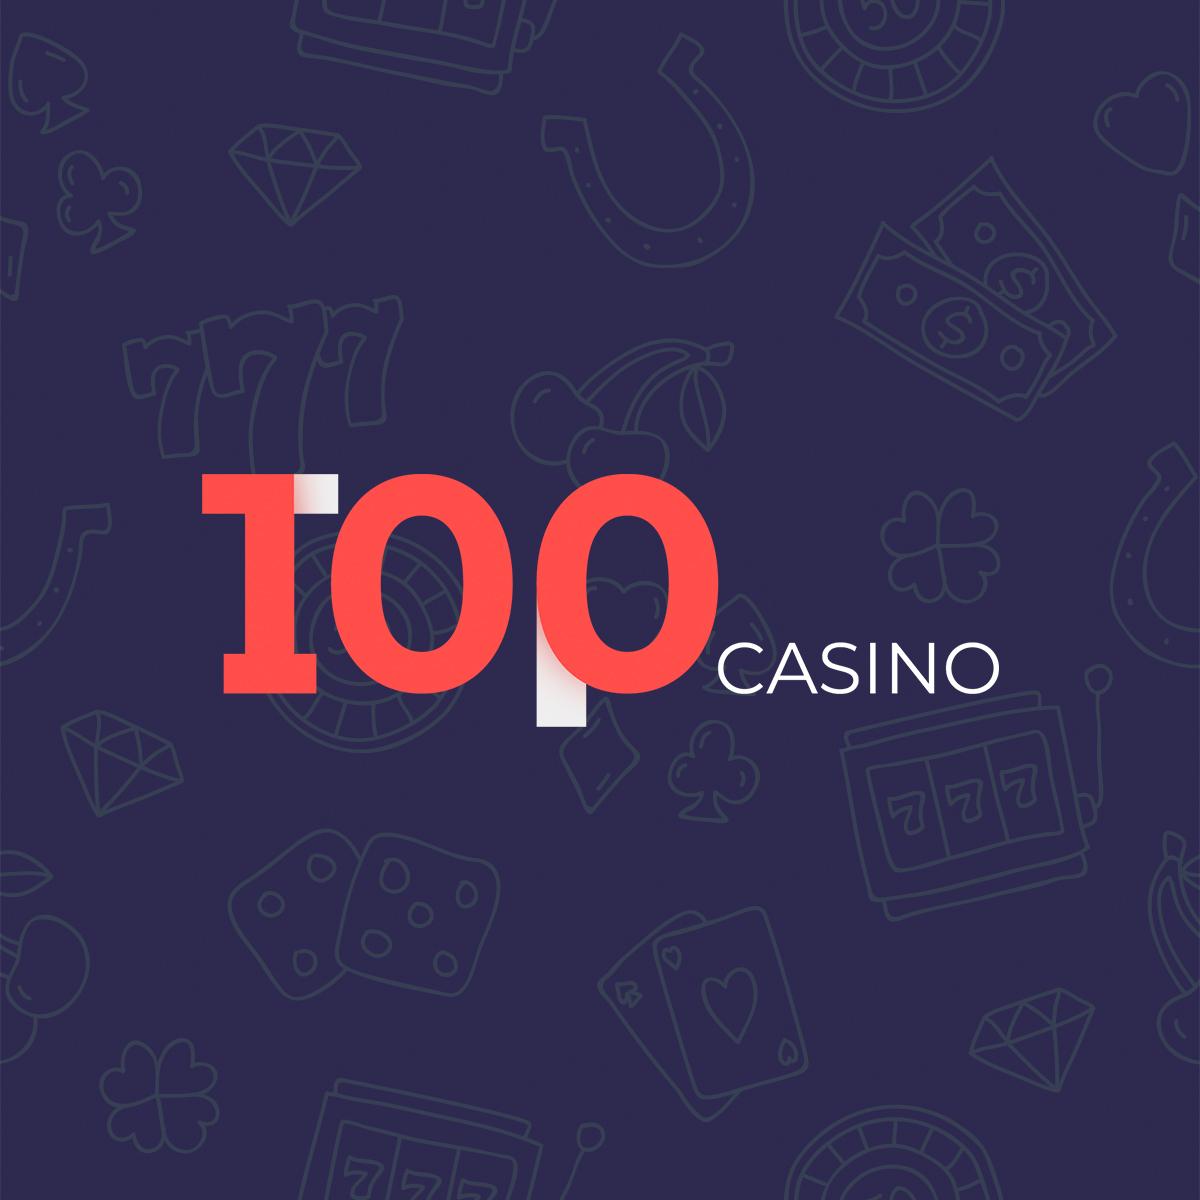 Casino en riktig upplevelse 14338